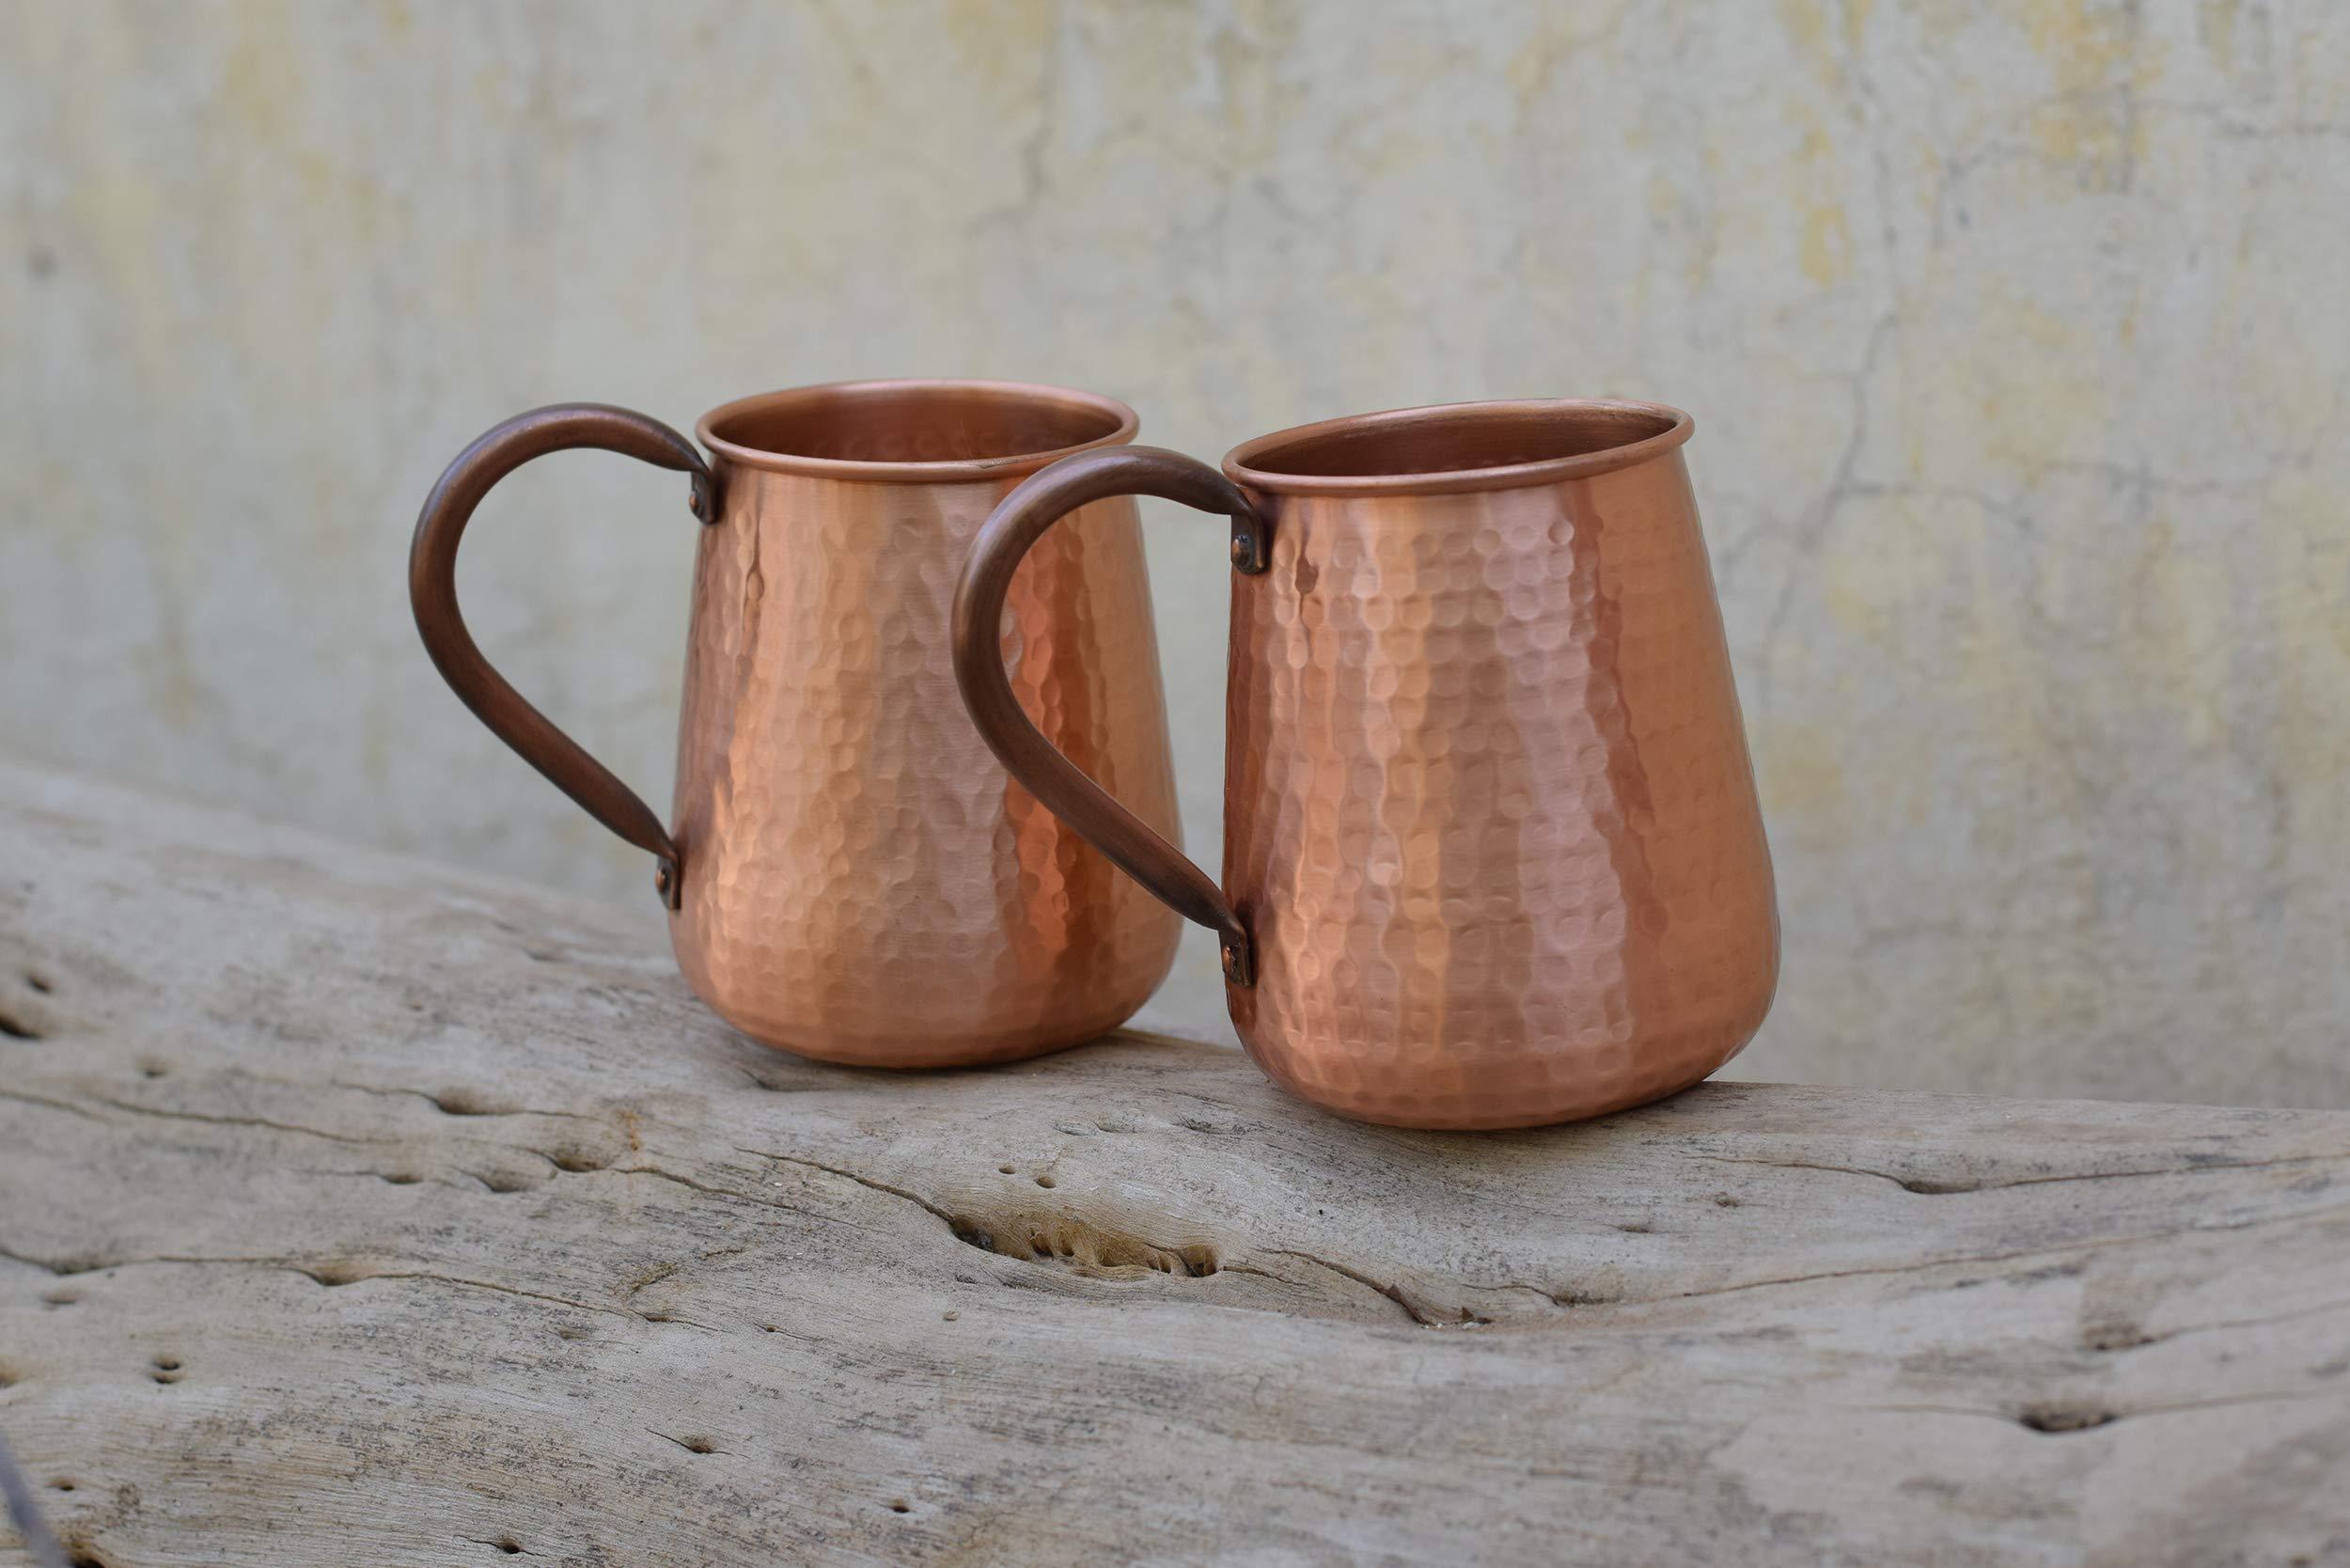 De Kulture Works Handmade Pure Copper Mug Moscow Mule Set of 2-500 ml (Brown) by De Kulture Works (Image #3)